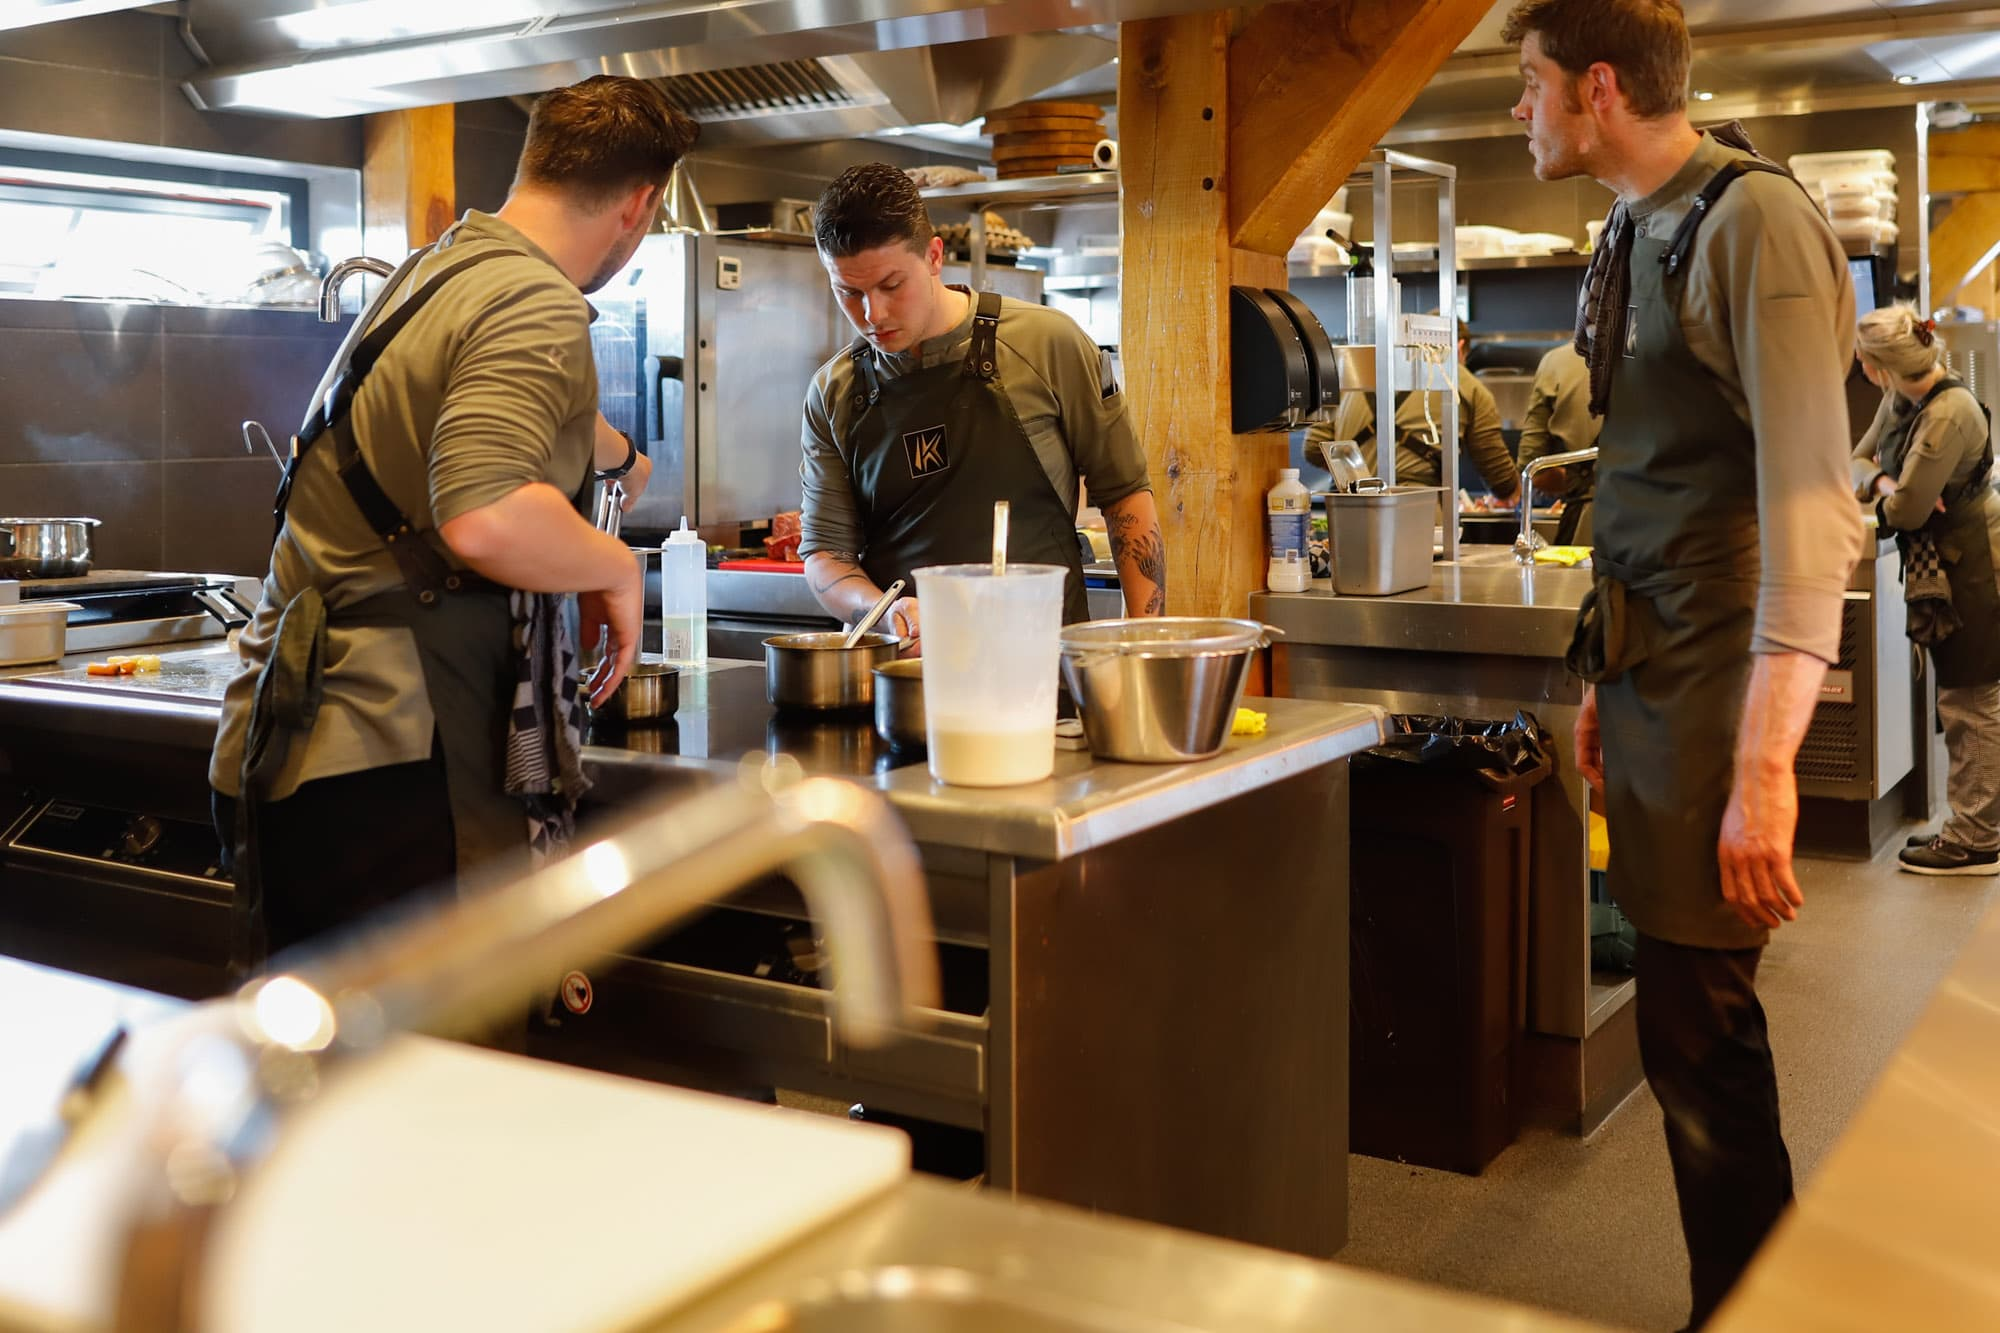 Restaurant Krelis werkende koks in de keuken